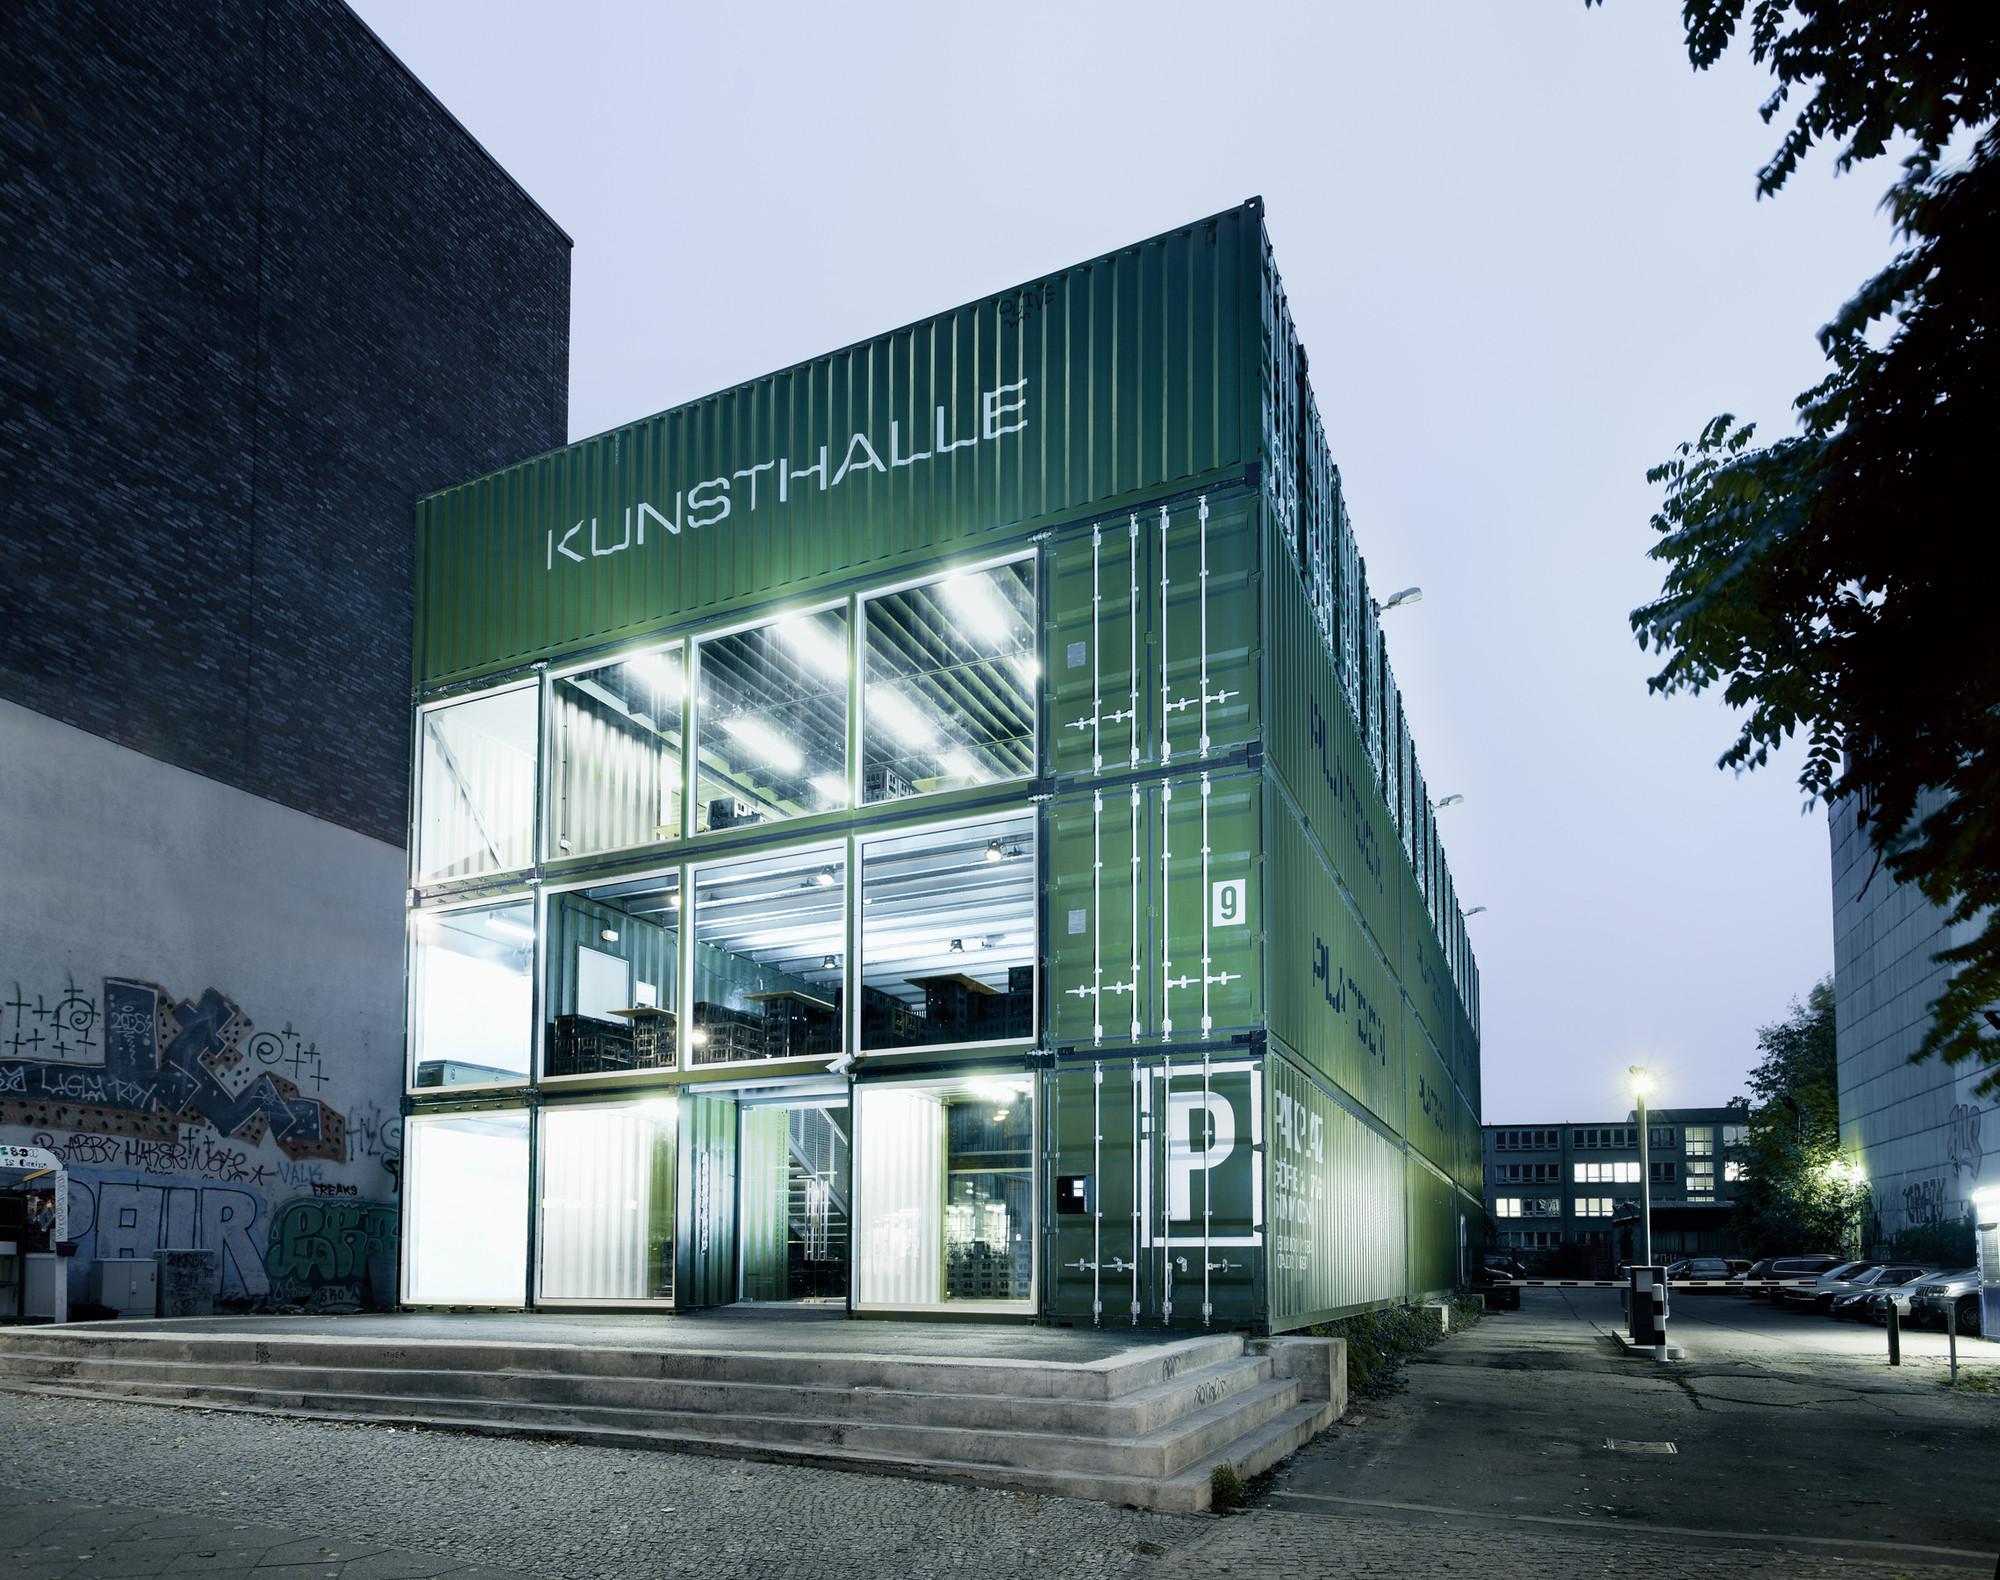 Platoon Kunsthalle Berlin / Platoon Cultural Development, Courtesy of Platoon Kunsthalle Berlin